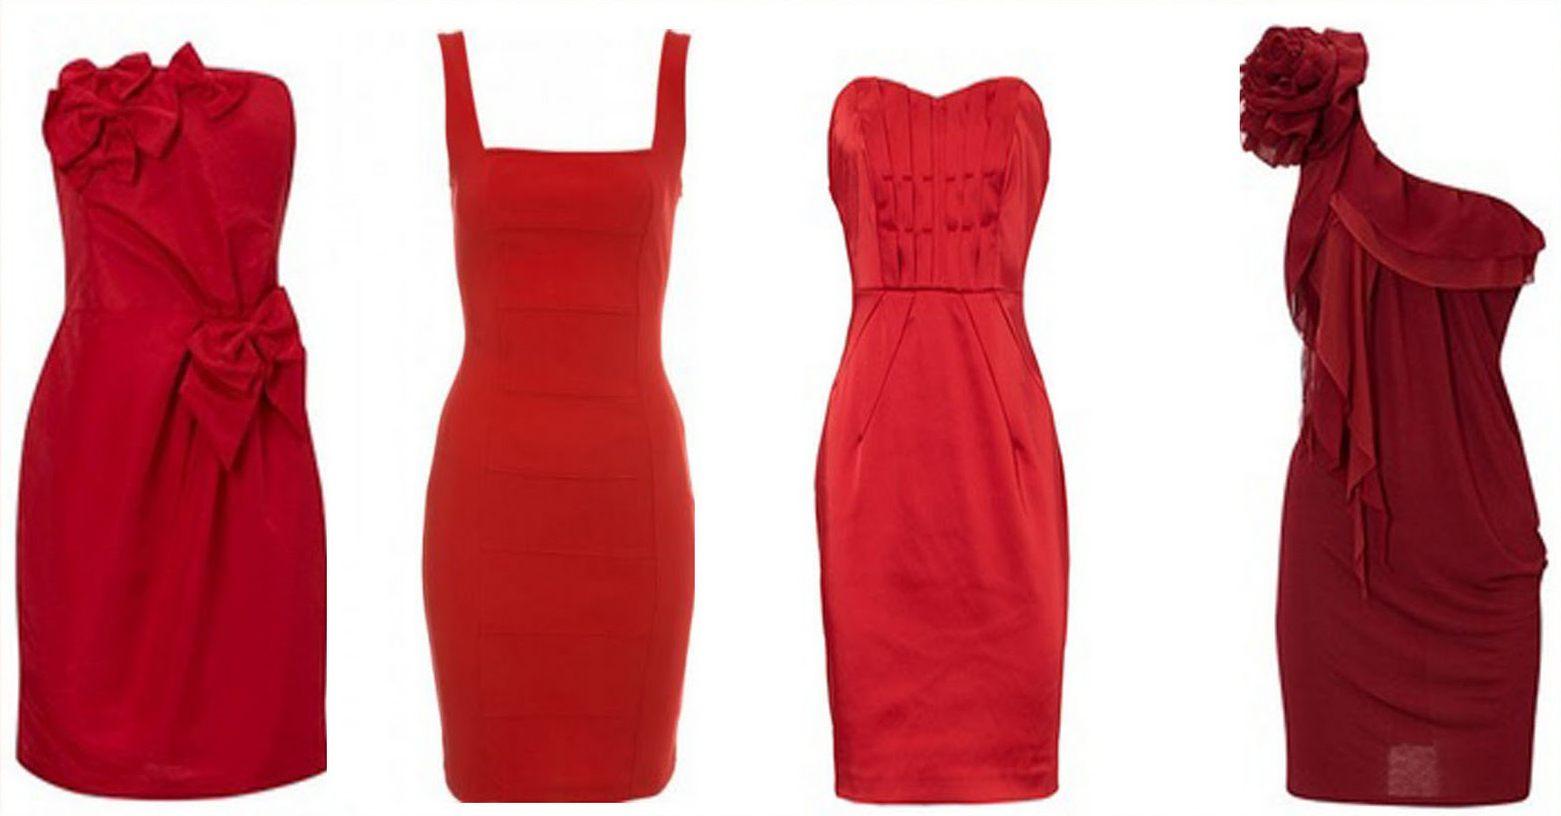 317610 natal vestidos Vestidos para o Natal 2012: modelos